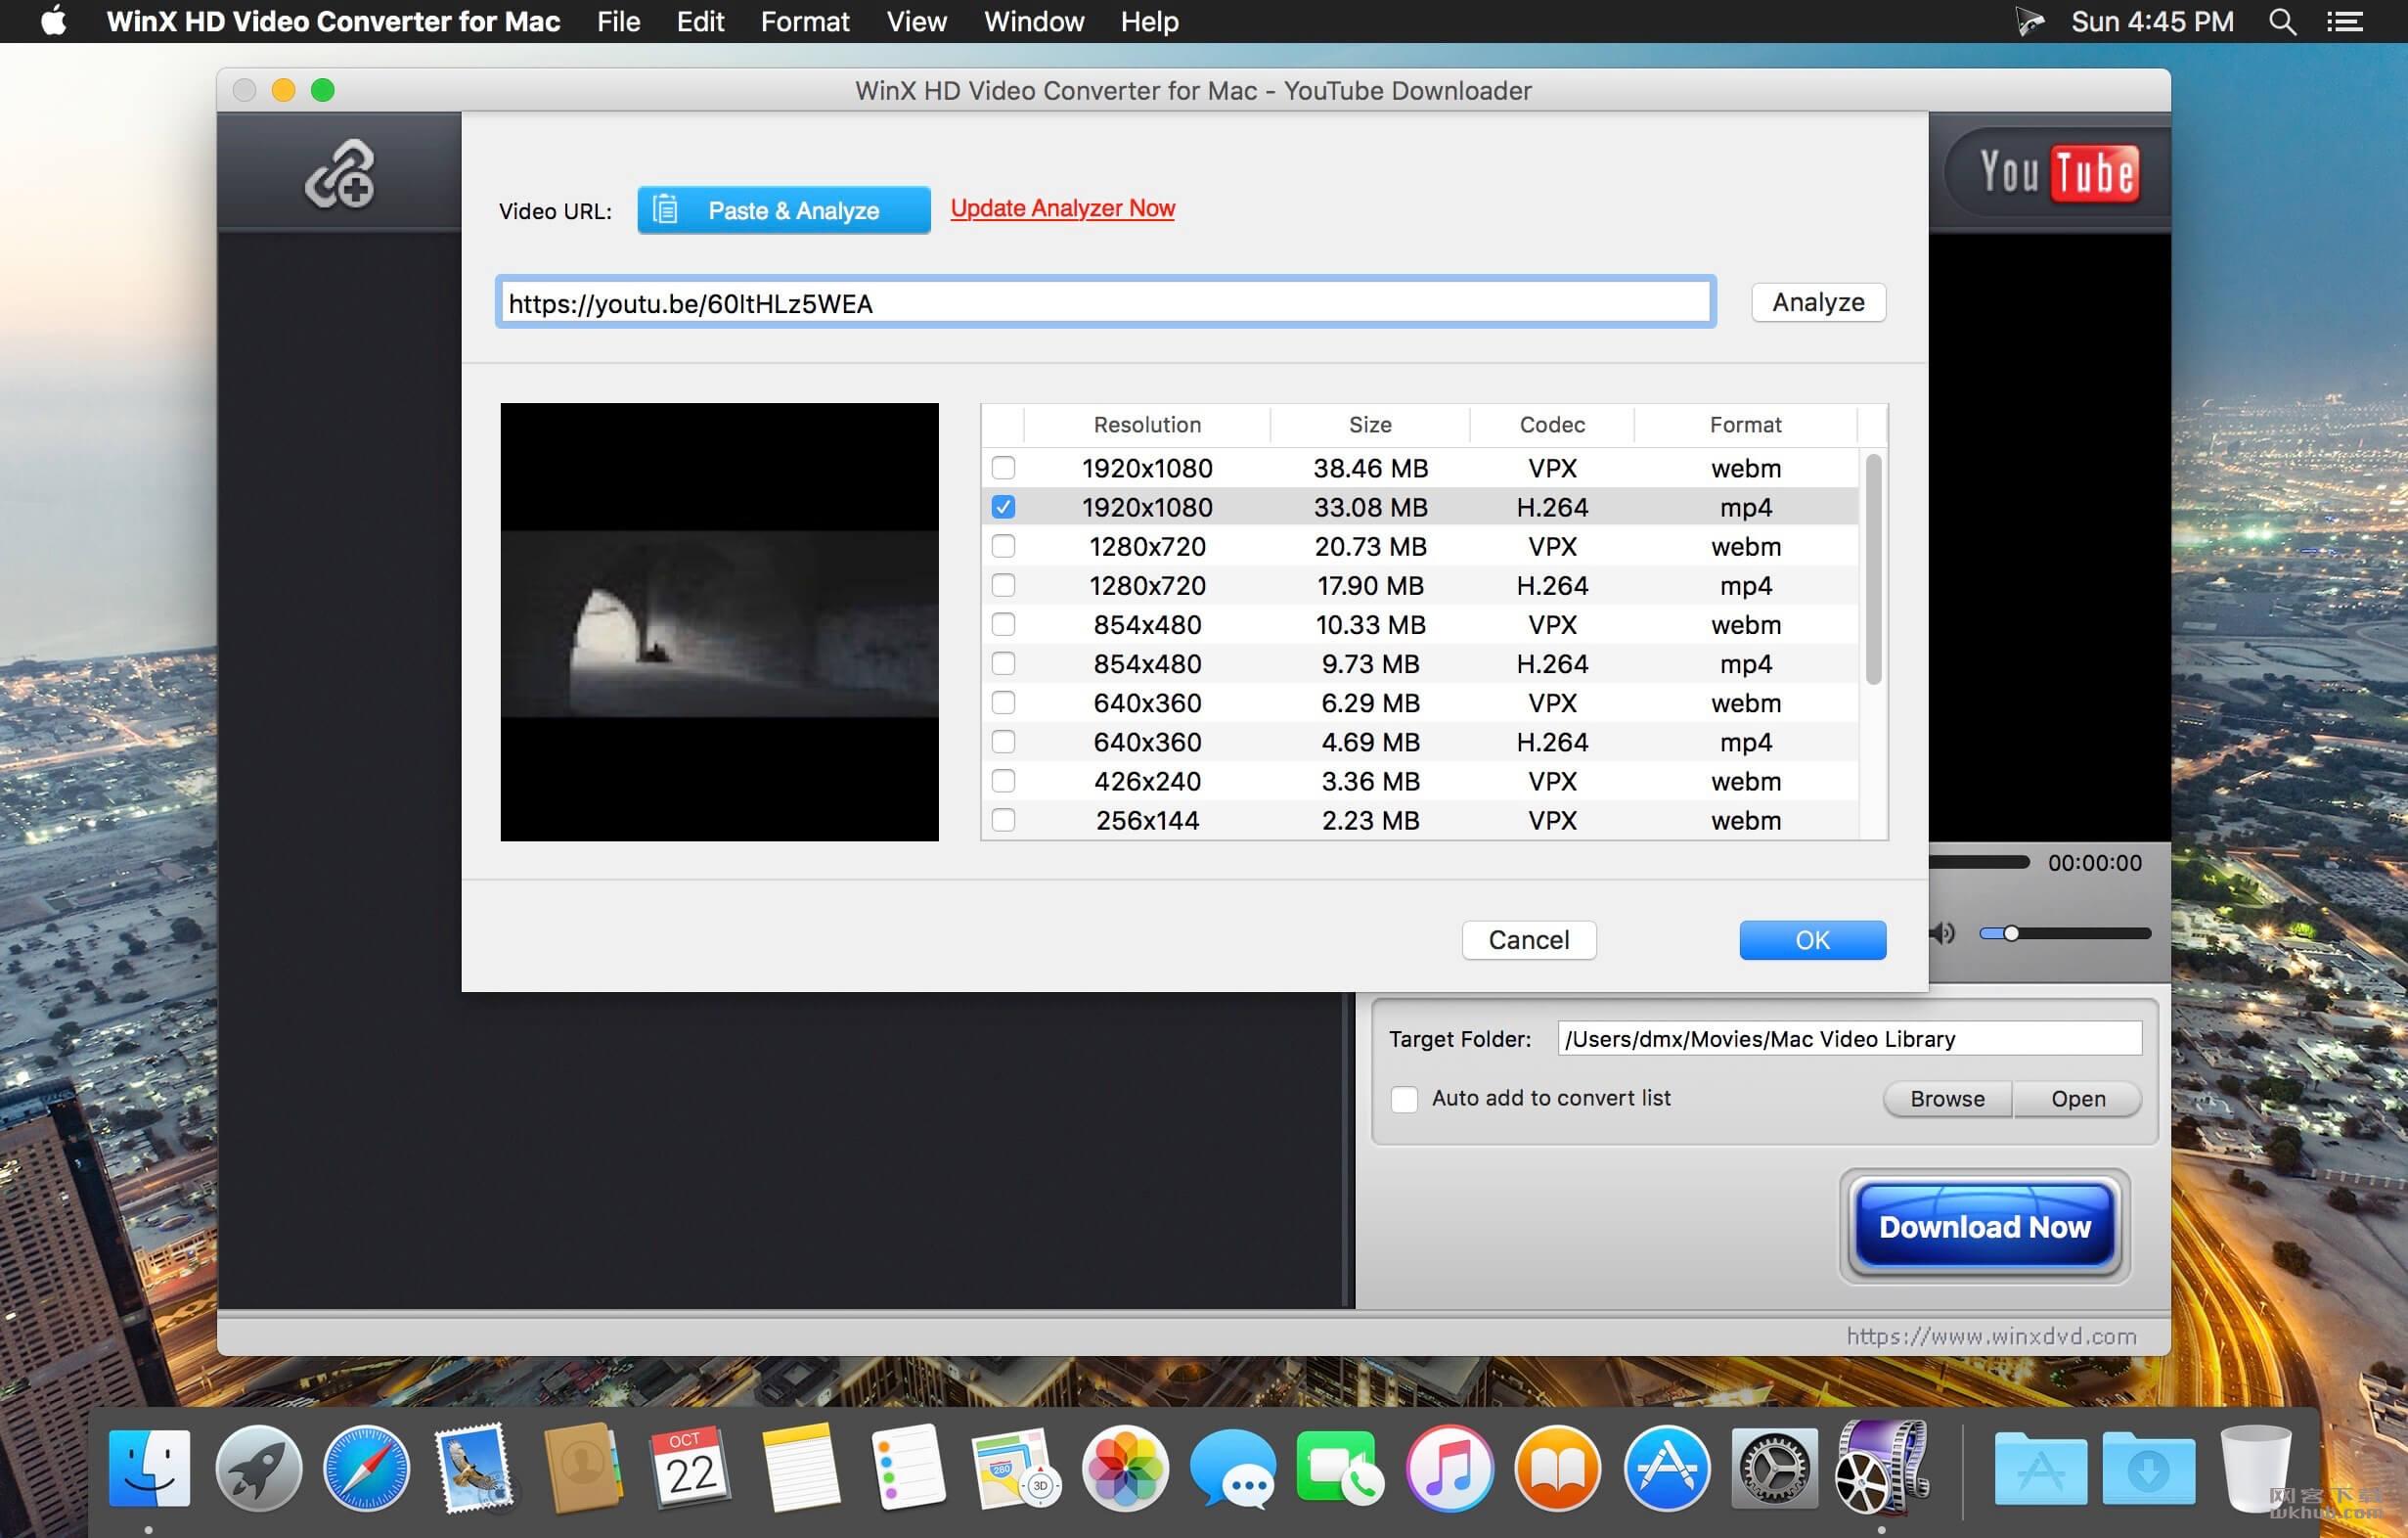 WinX HD Video Converter 6.4.5 高清视频转换工具